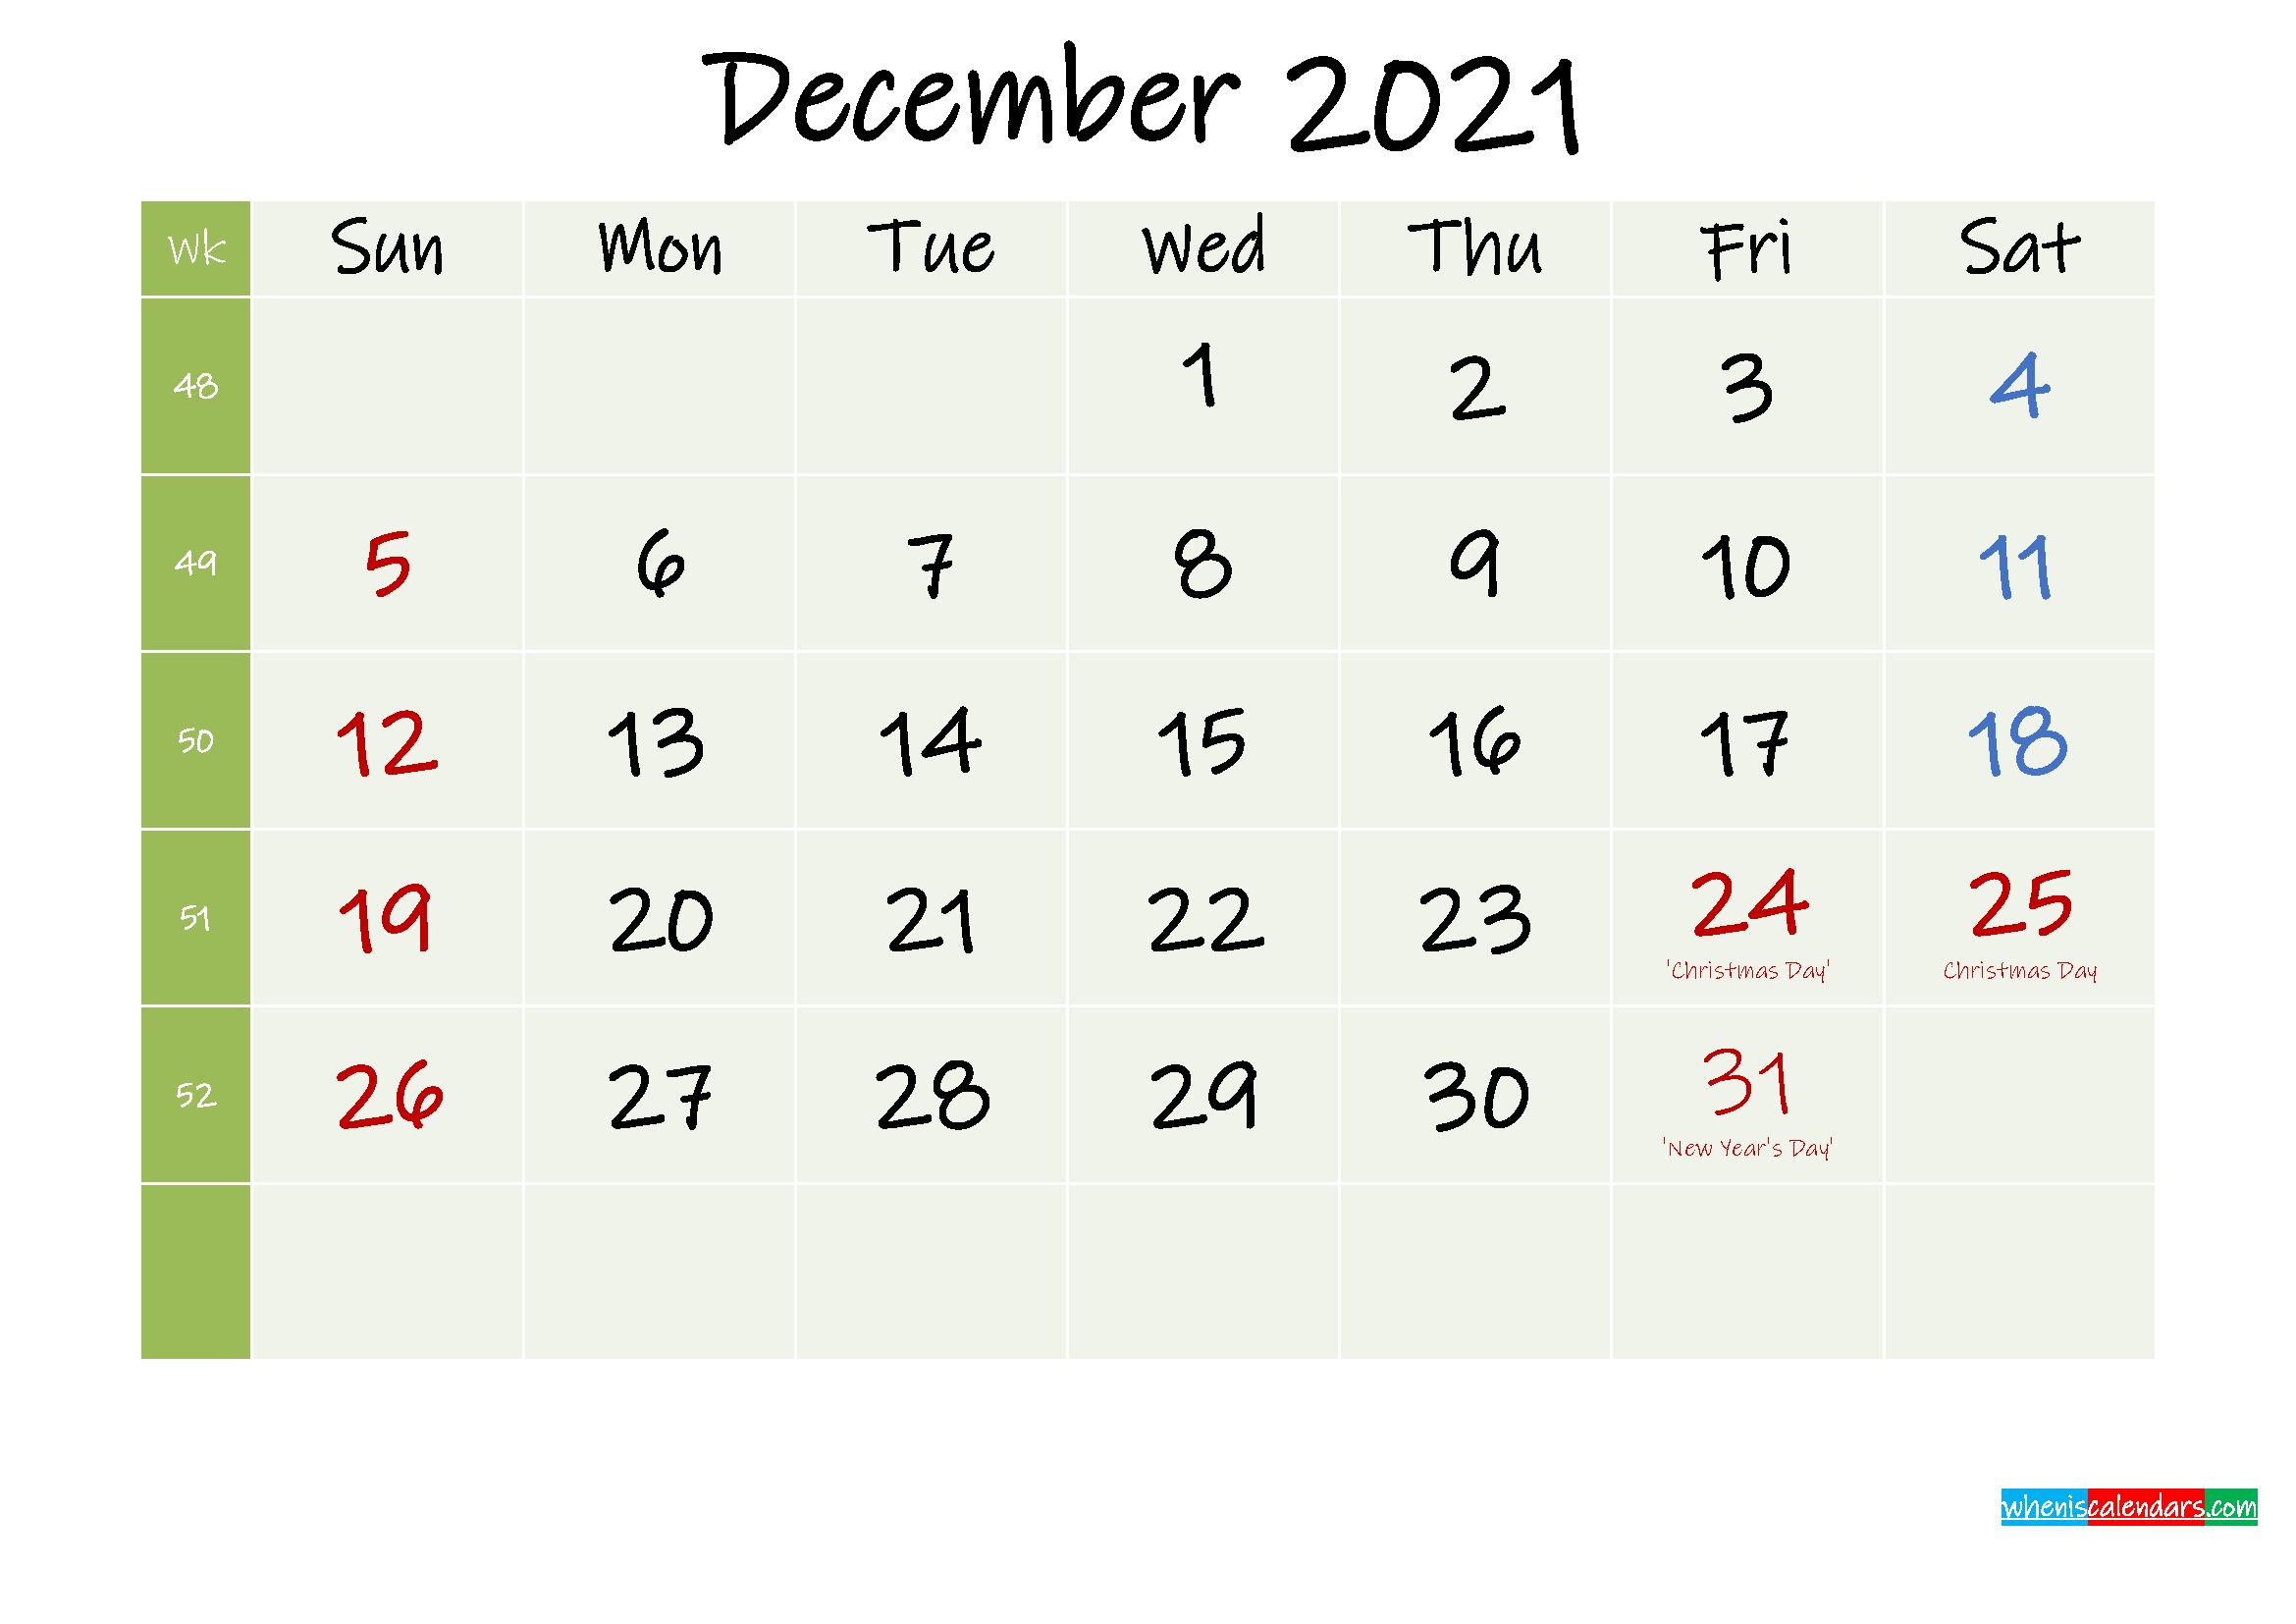 December 2021 Calendar with Holidays Printable